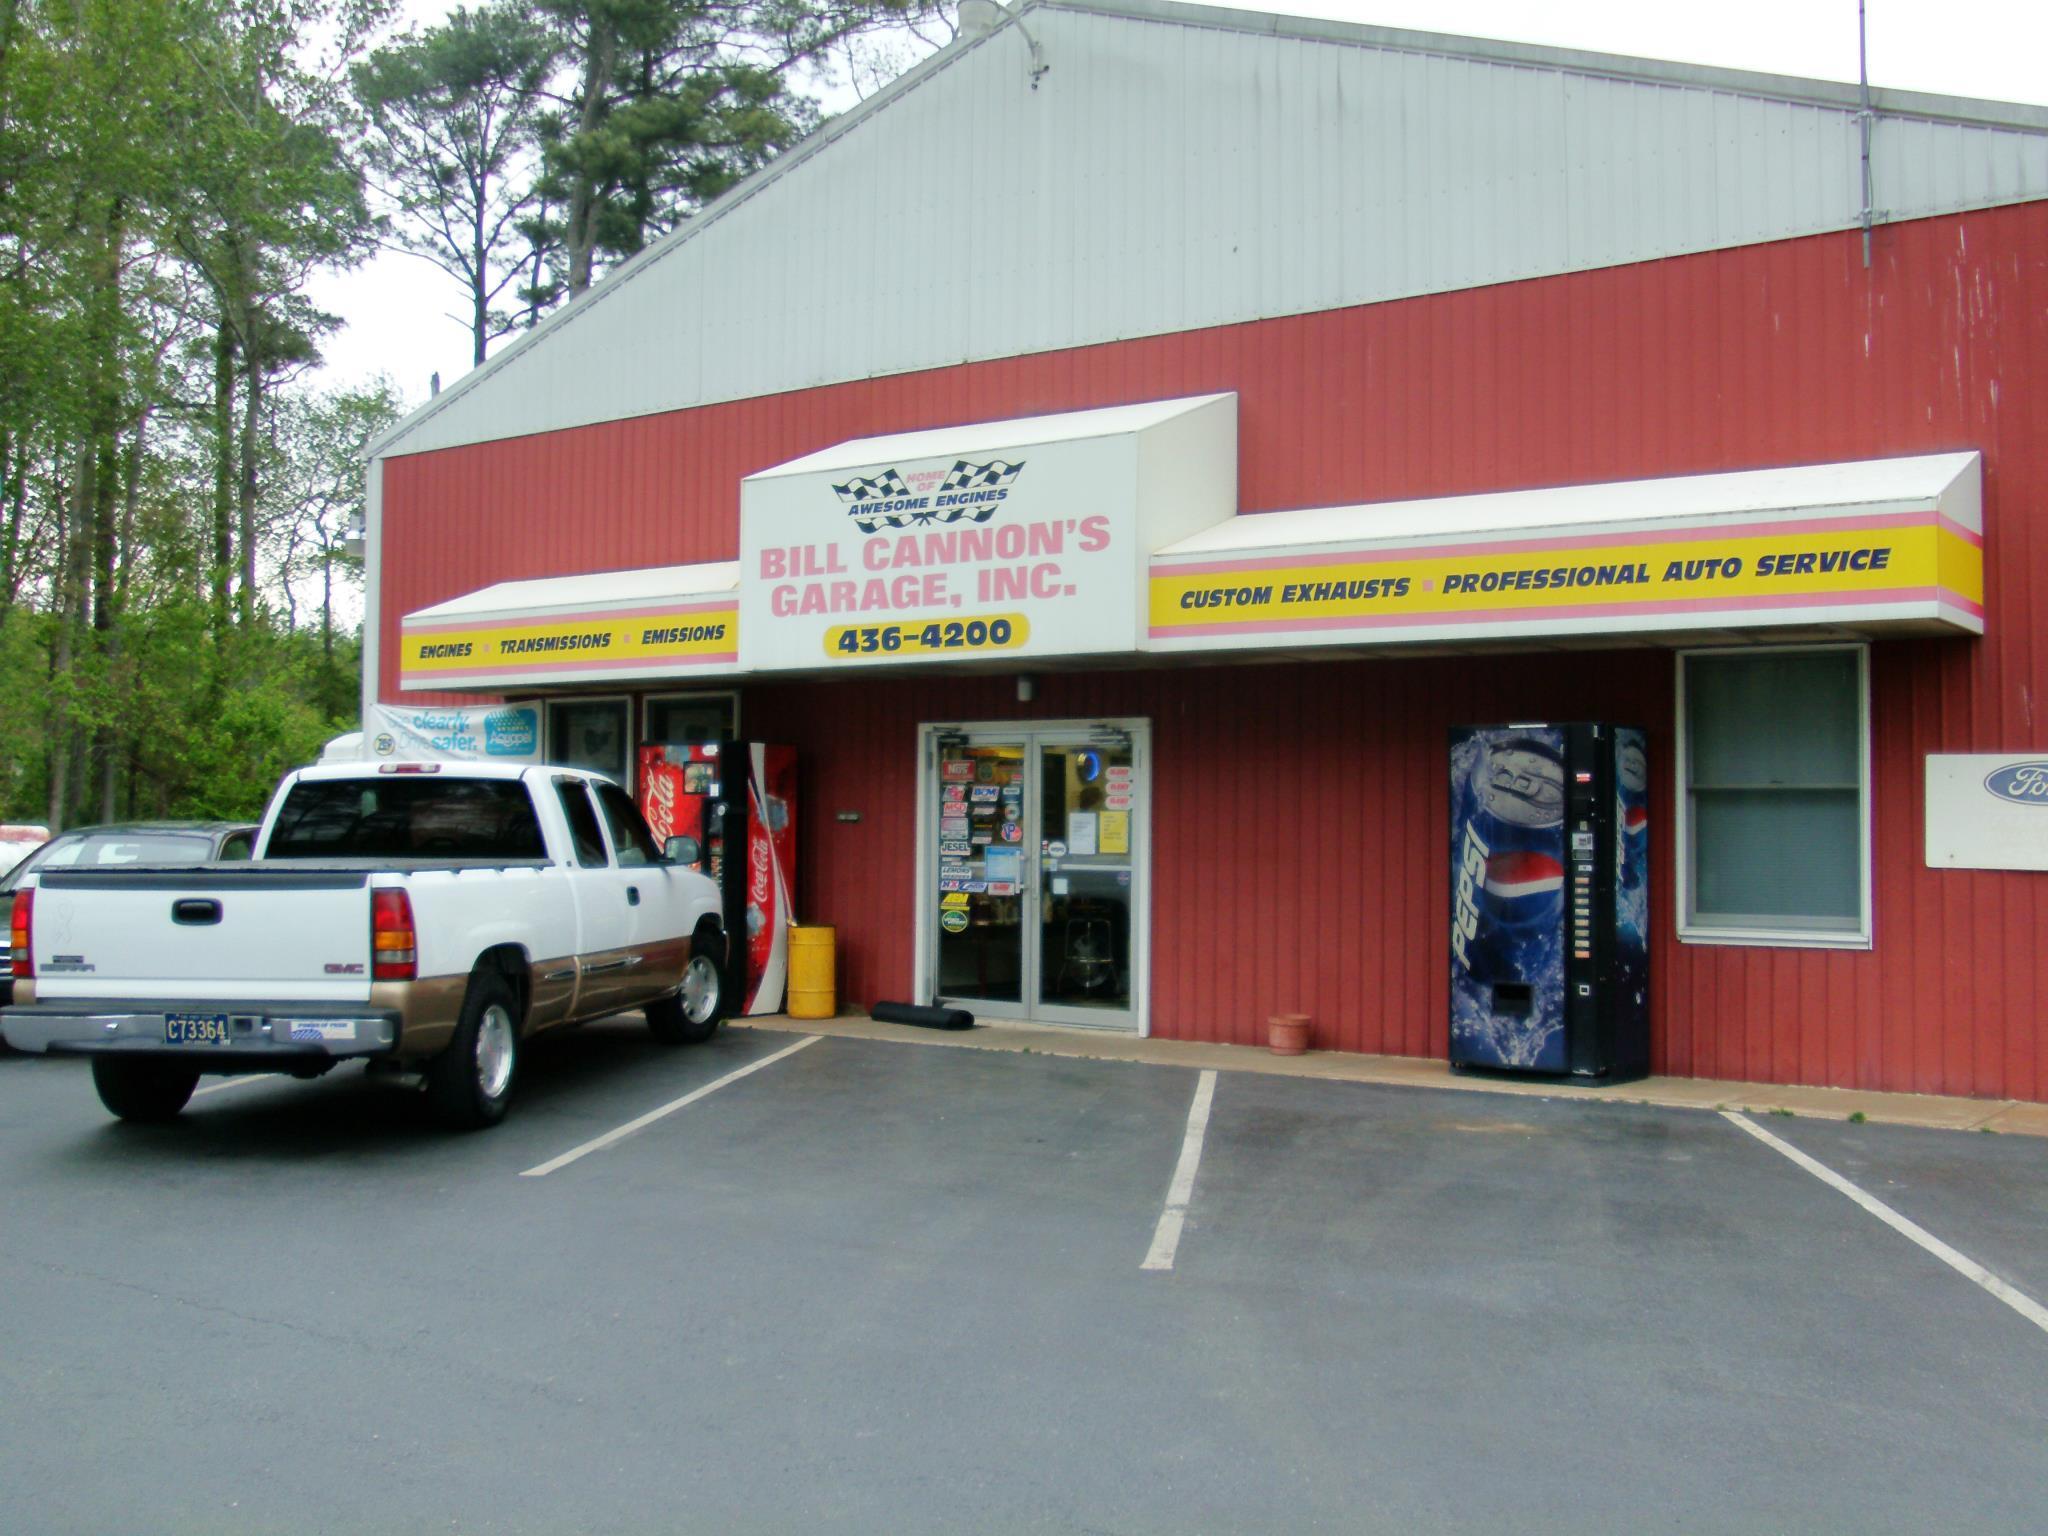 Bill Cannon's Garage, Inc image 0